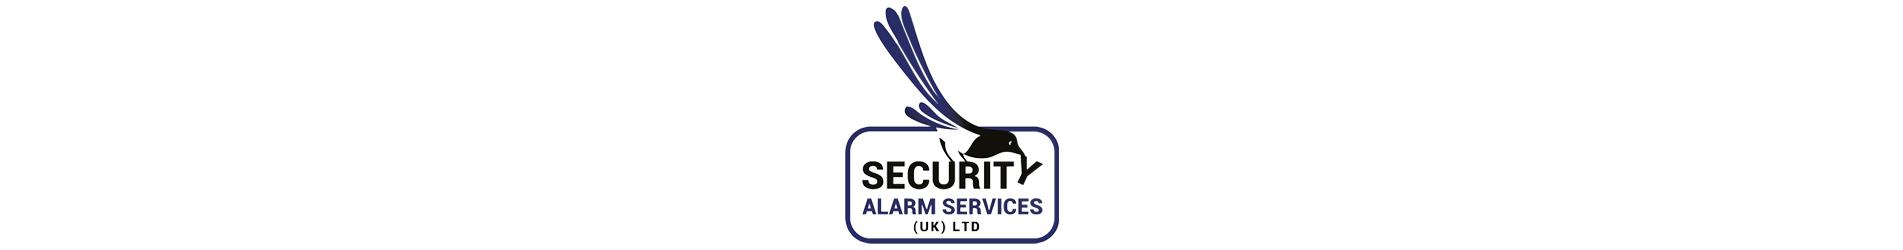 Security Alarm Services